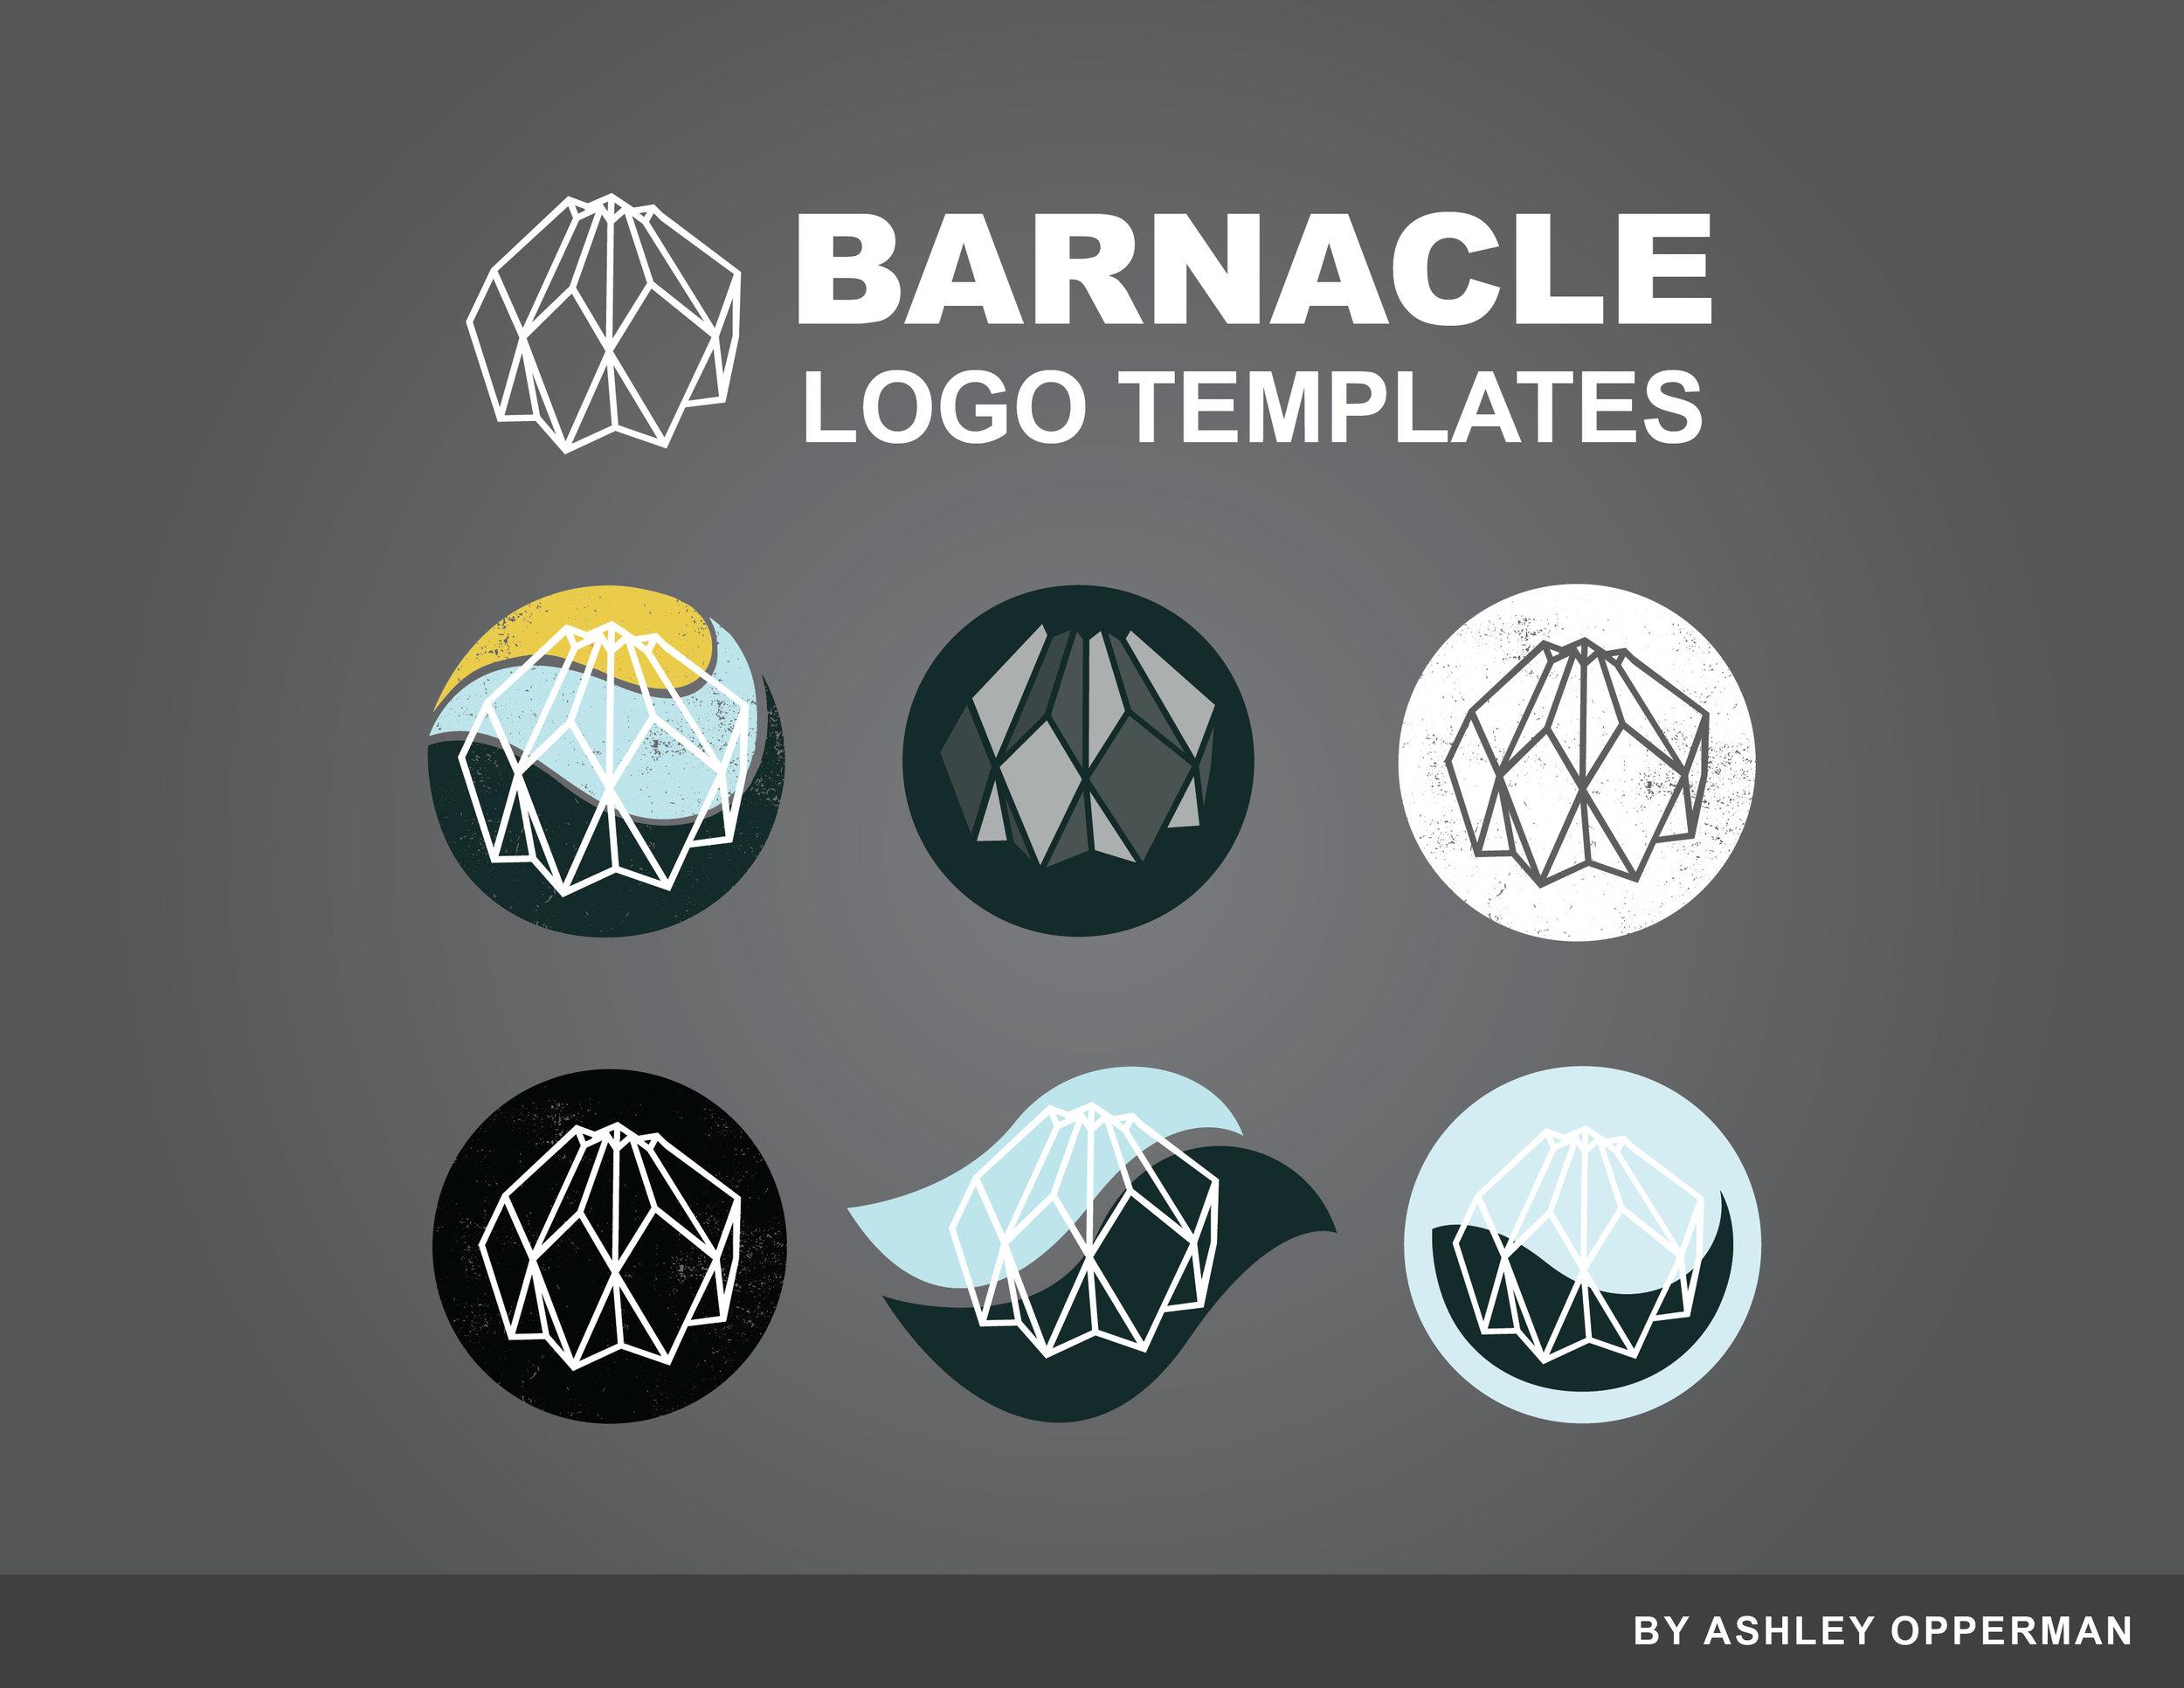 Barnacle-Logo-01-Oct2018-01.jpg